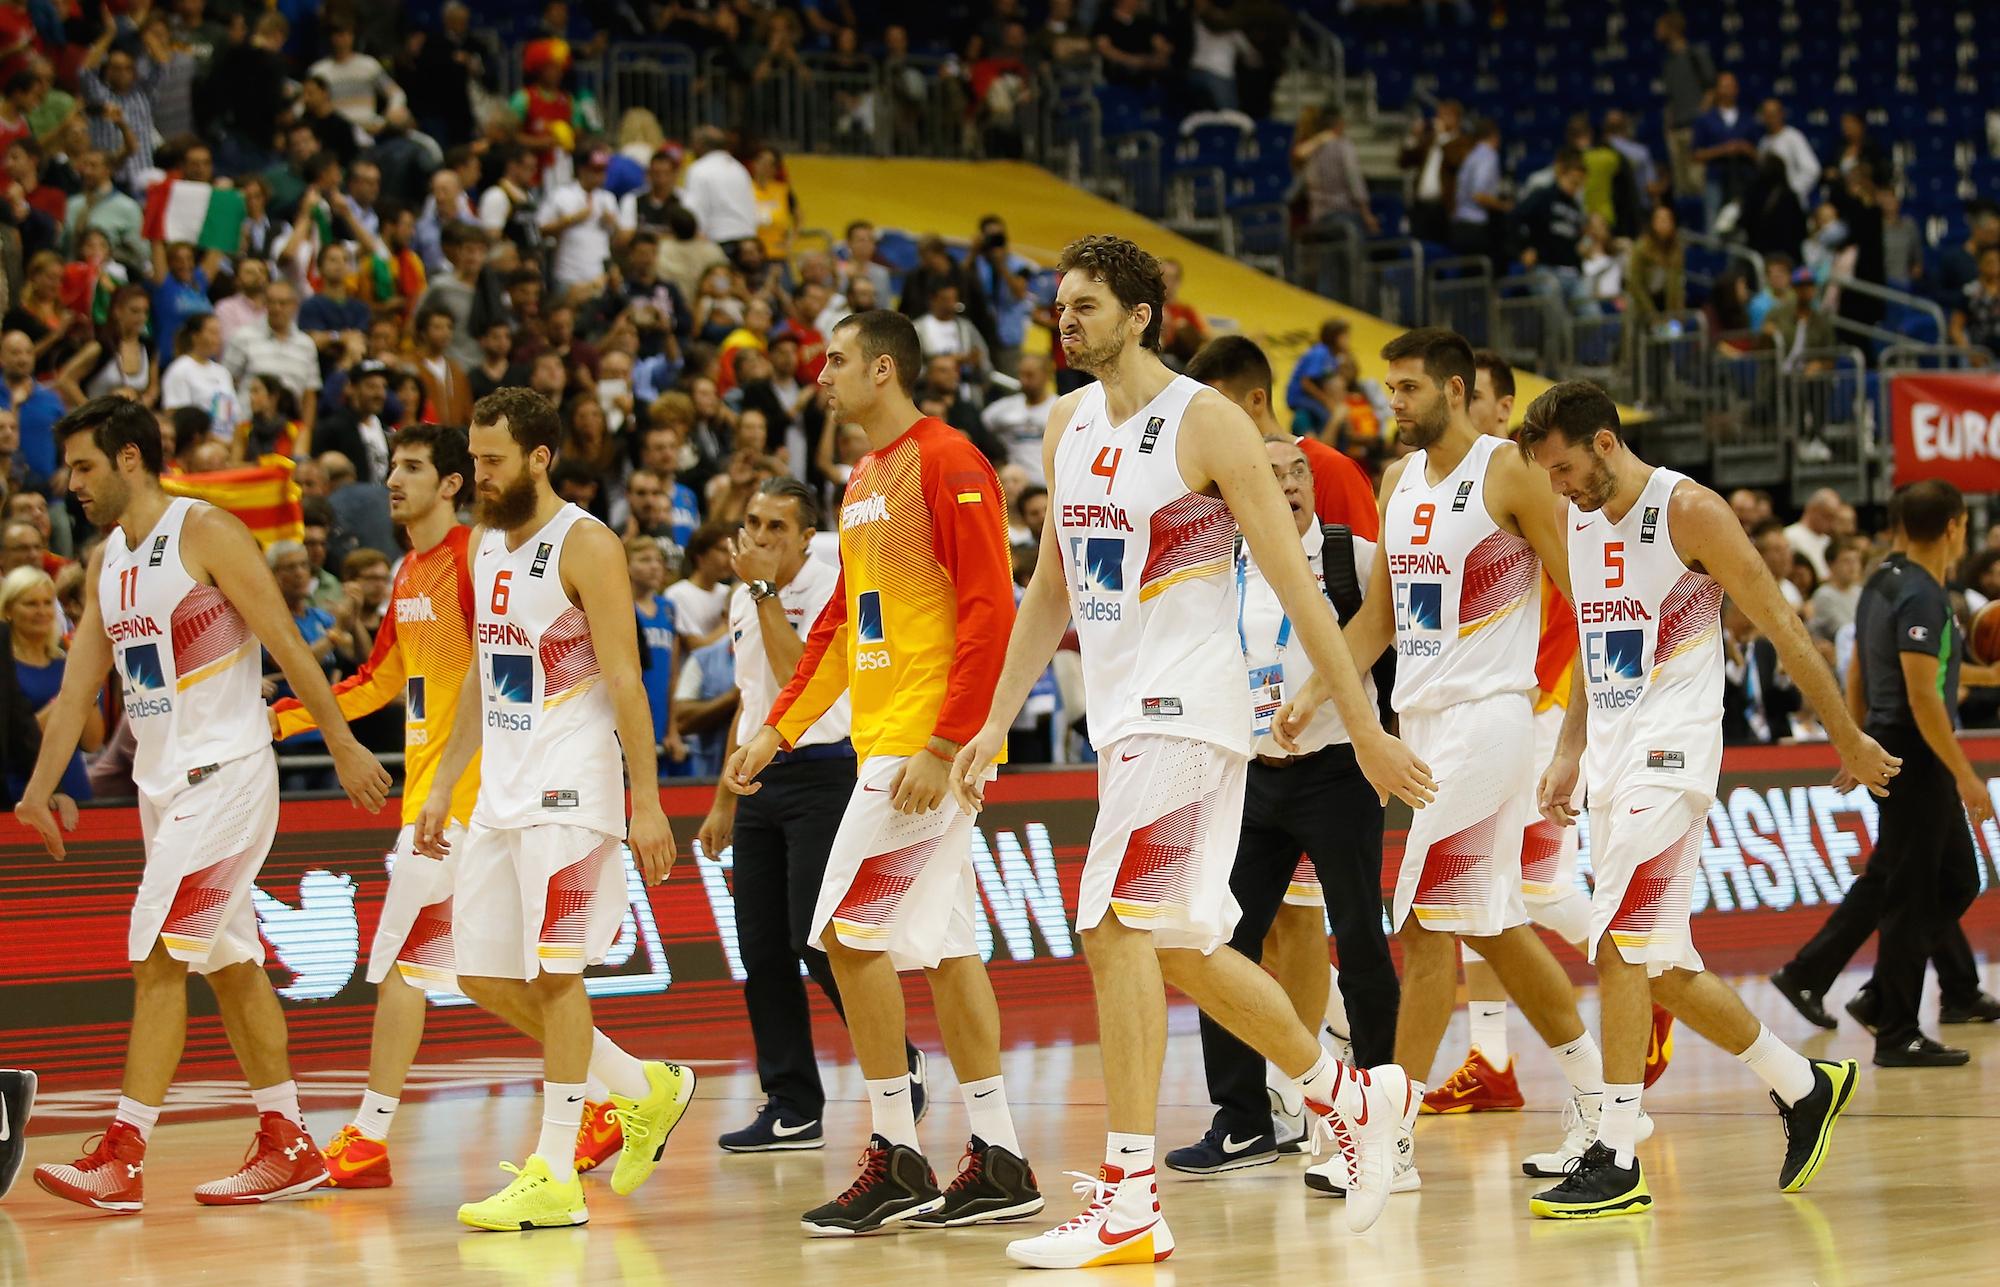 Spain v Italy - FIBA Eurobasket 2015